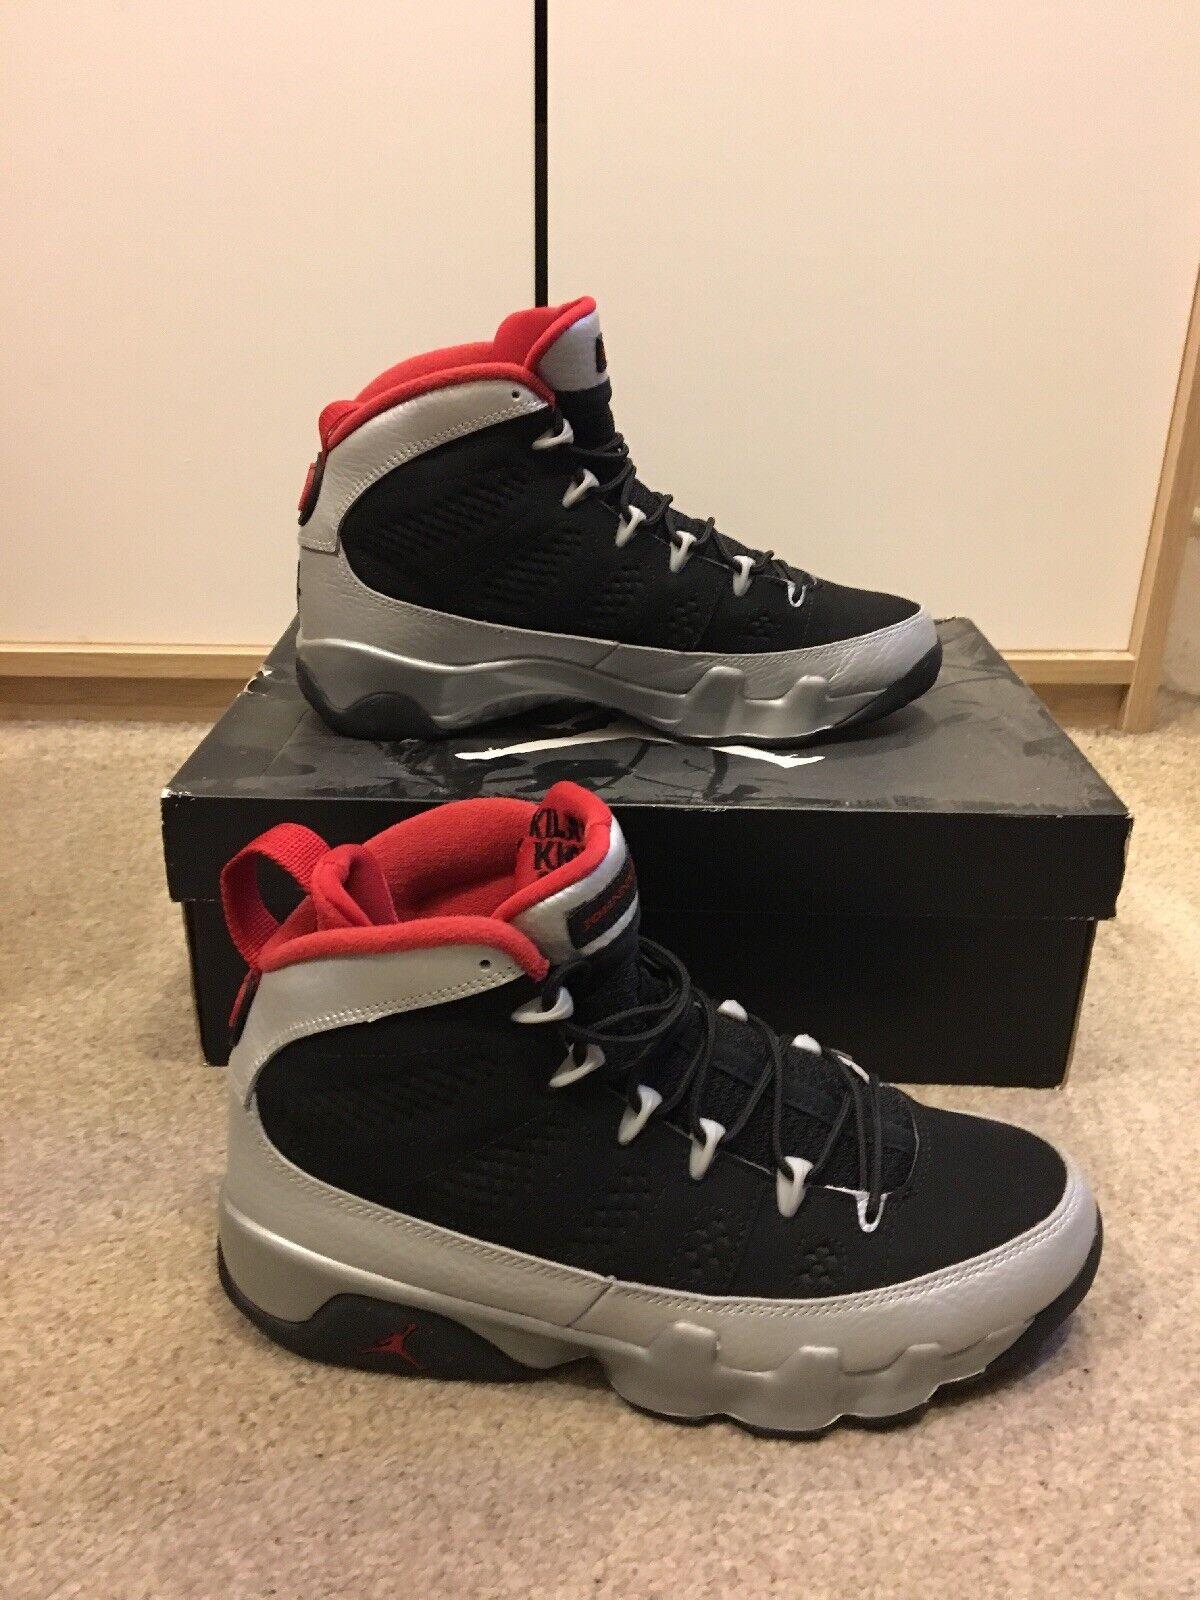 Nike Air Jordan 9 IX Retro - UK 6 - Johnny Kilroy